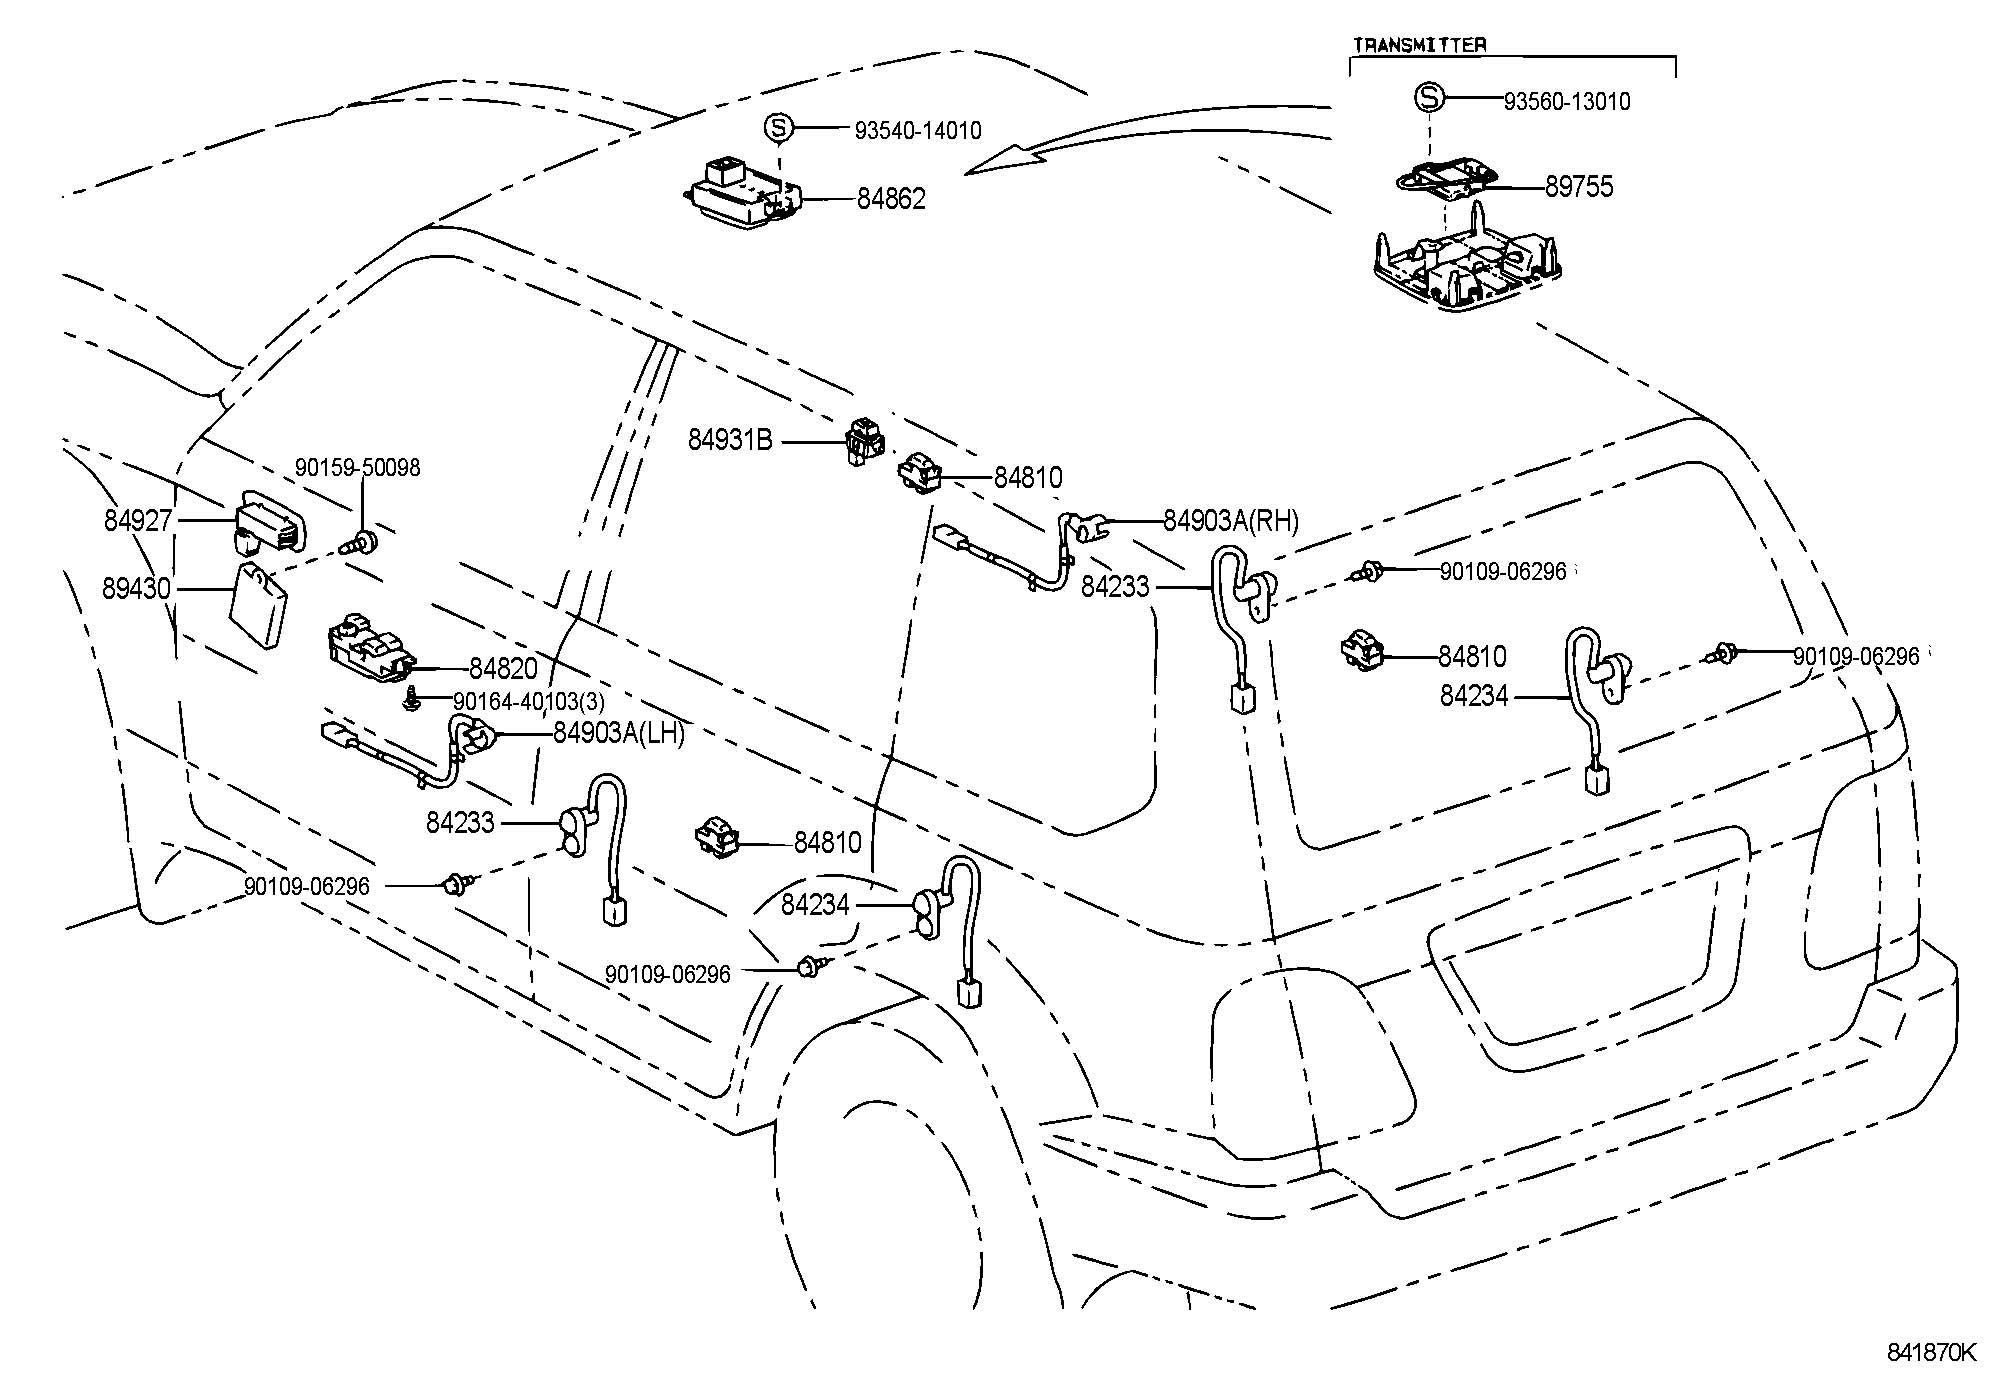 volkswagen touran fuse box layout